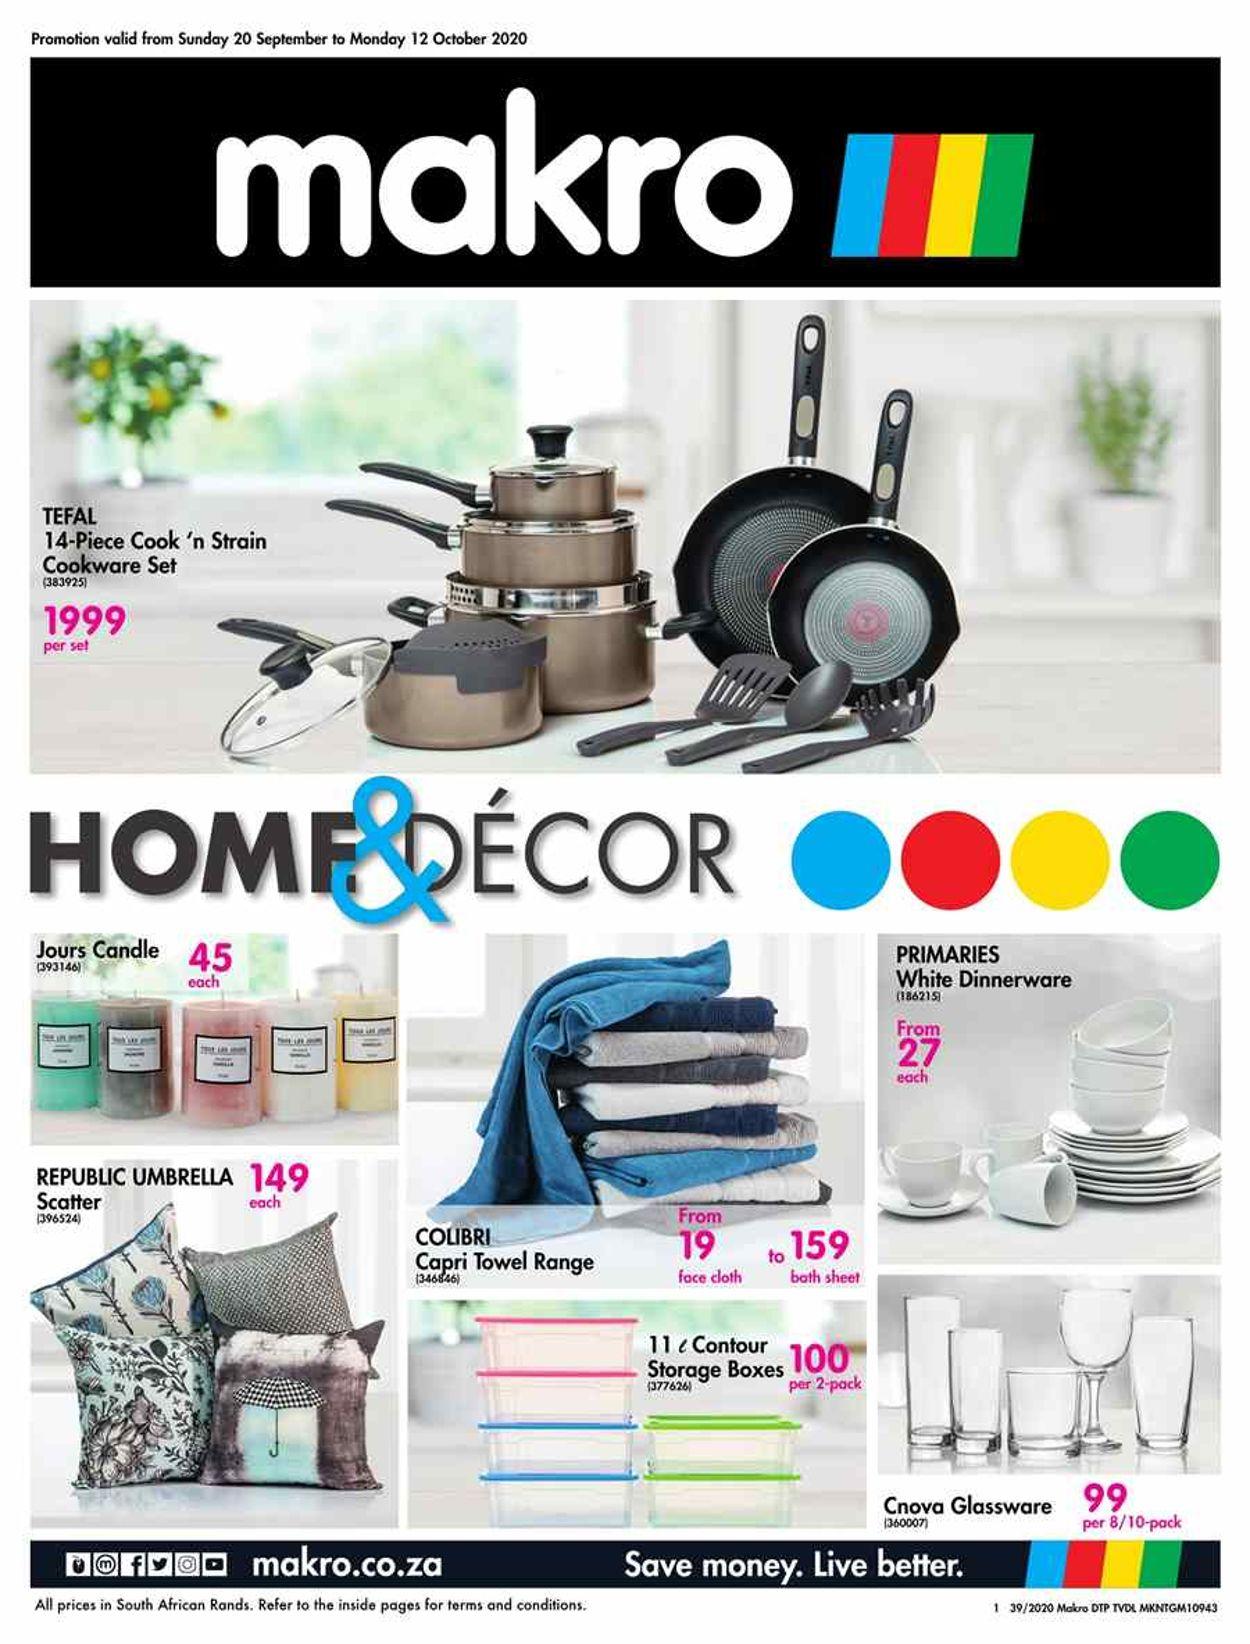 Makro Catalogue - 2020/09/20-2020/10/12